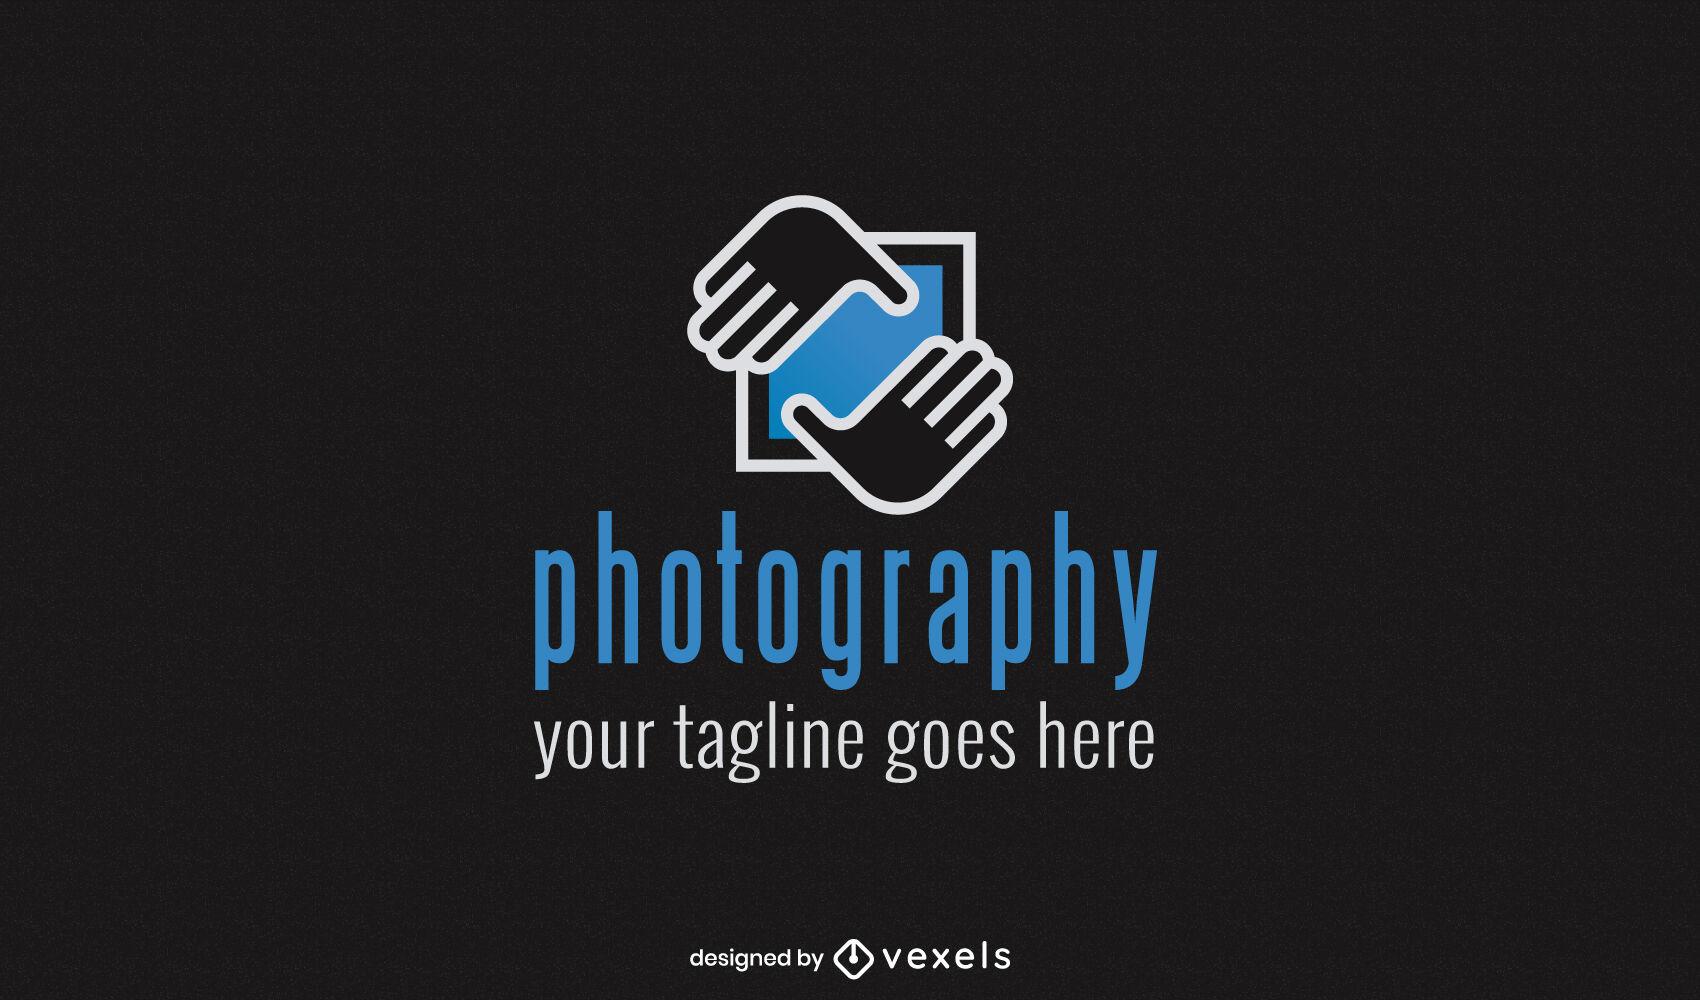 Hands framing photography logo design